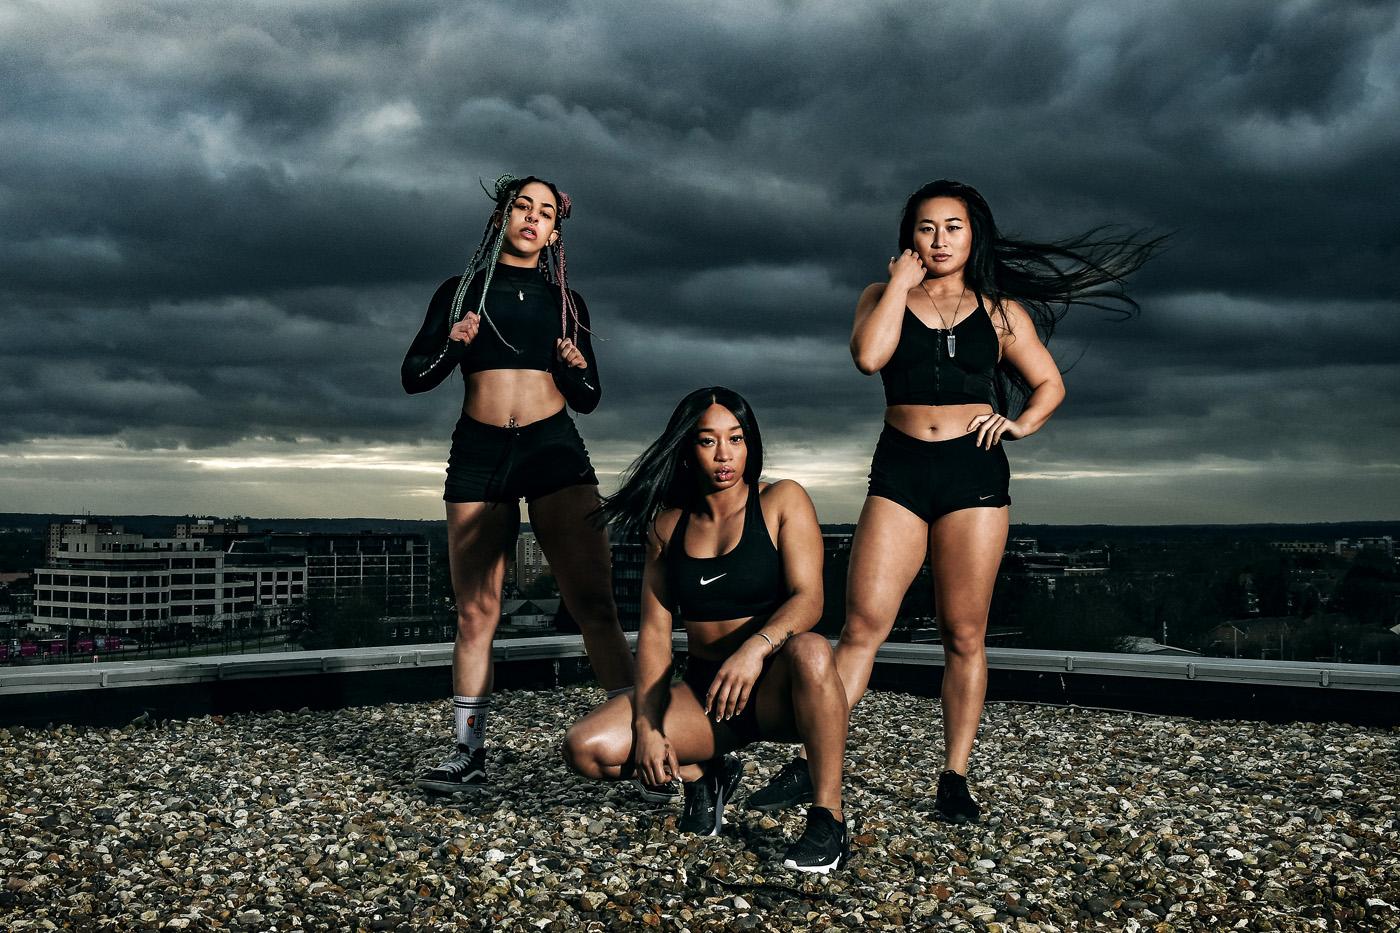 STRONG WOMEN 'POWER LIFTERS' -